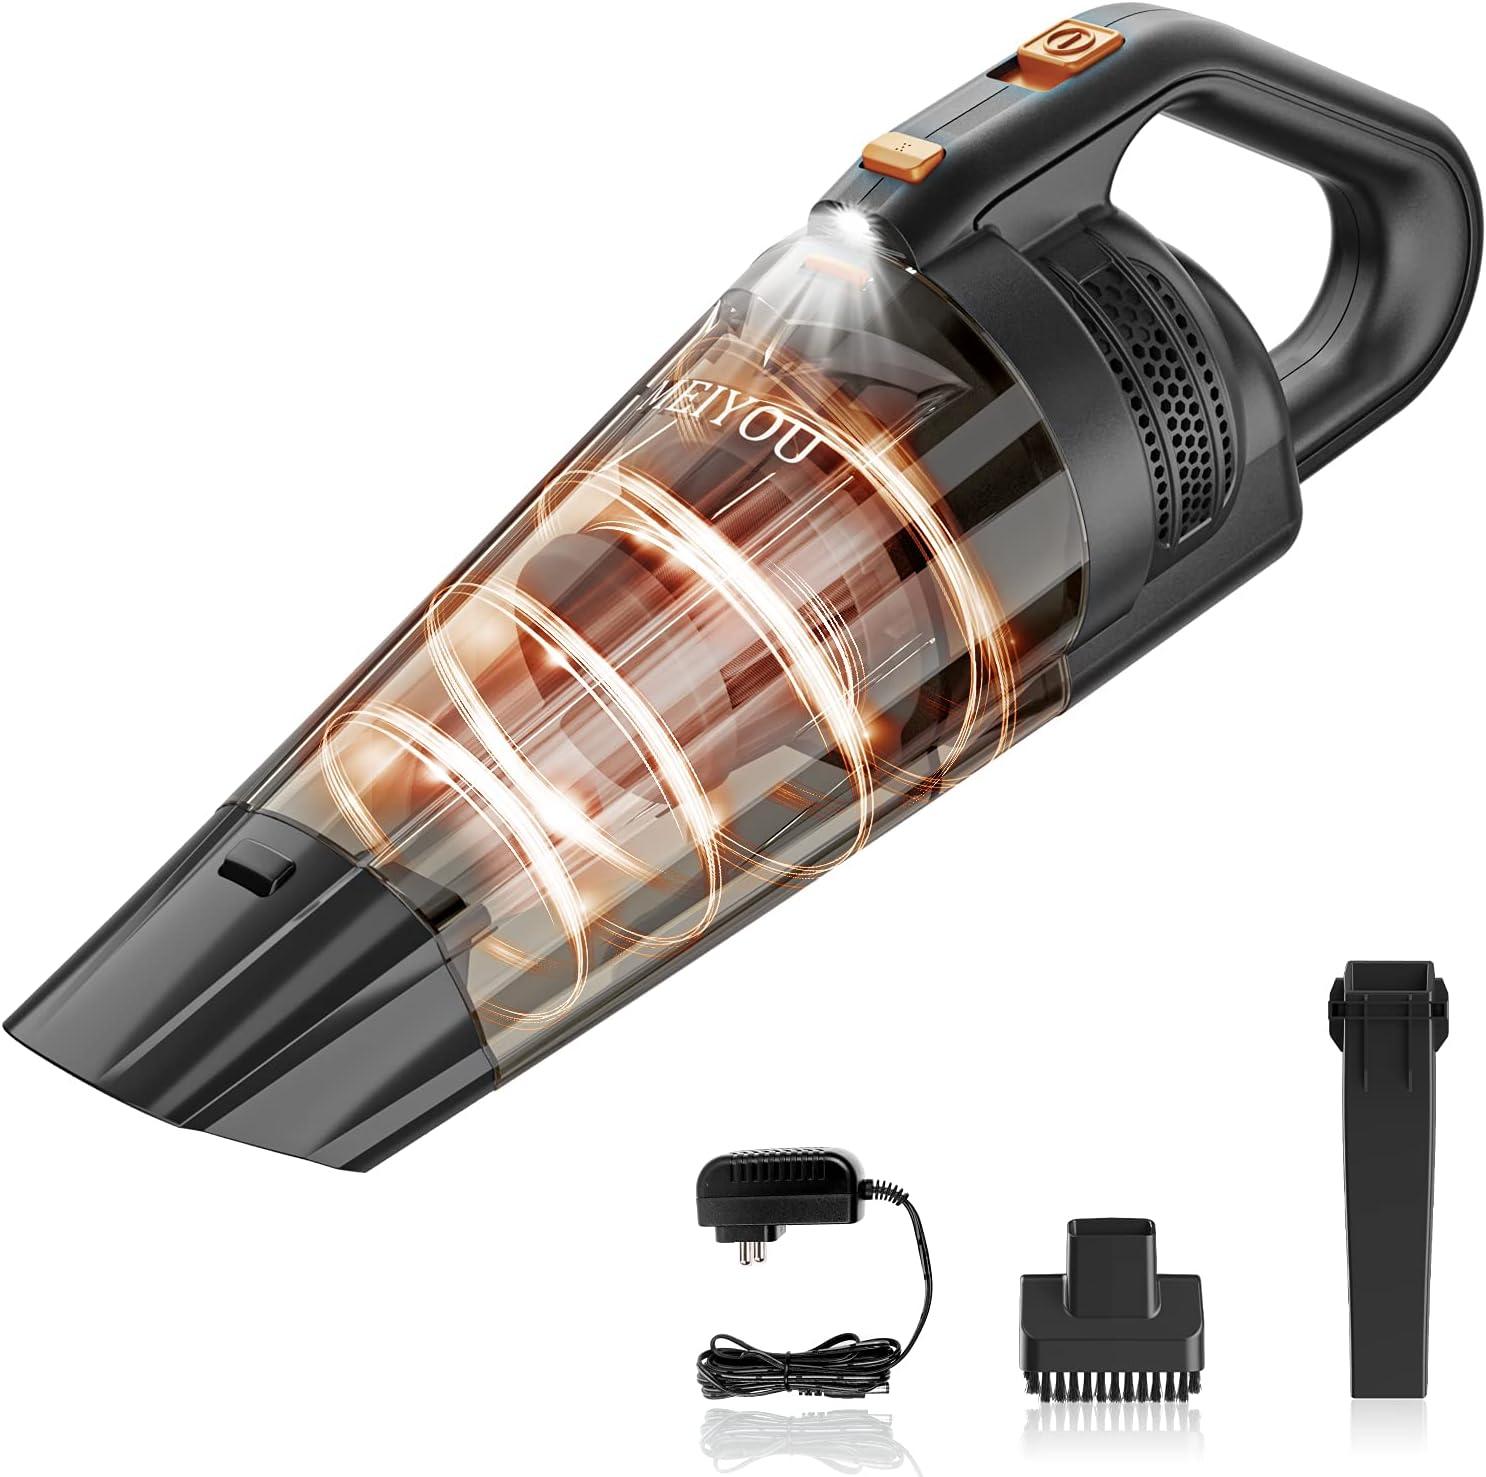 MEIYOU Handheld VacuumCordless PortableLightweight PowerfulRechargeable  9KPA 100W Strong Suction